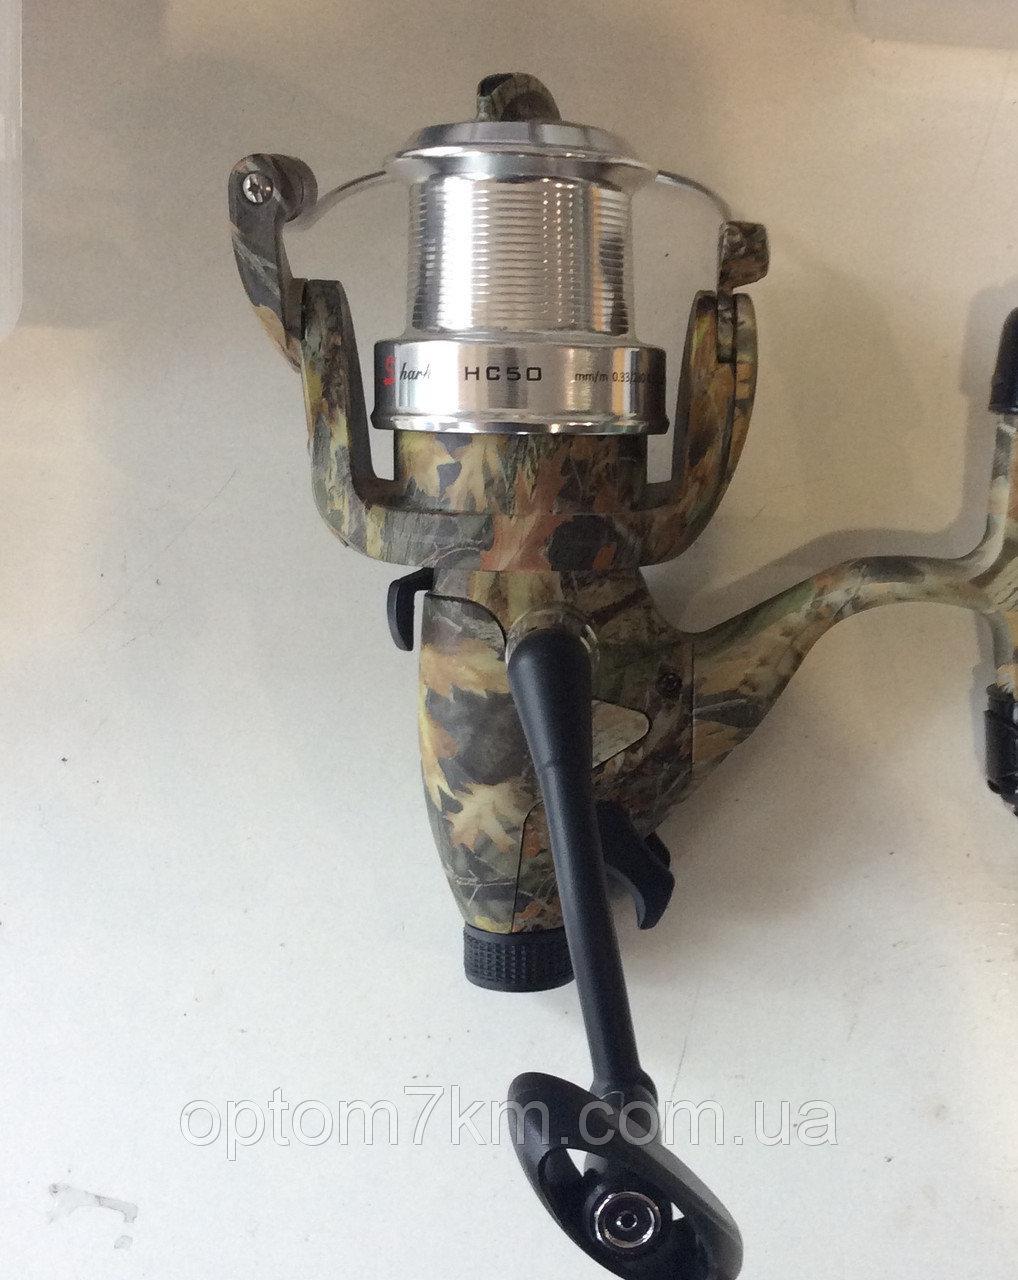 Катушка с байтраннером Shark HC-50, 8+1